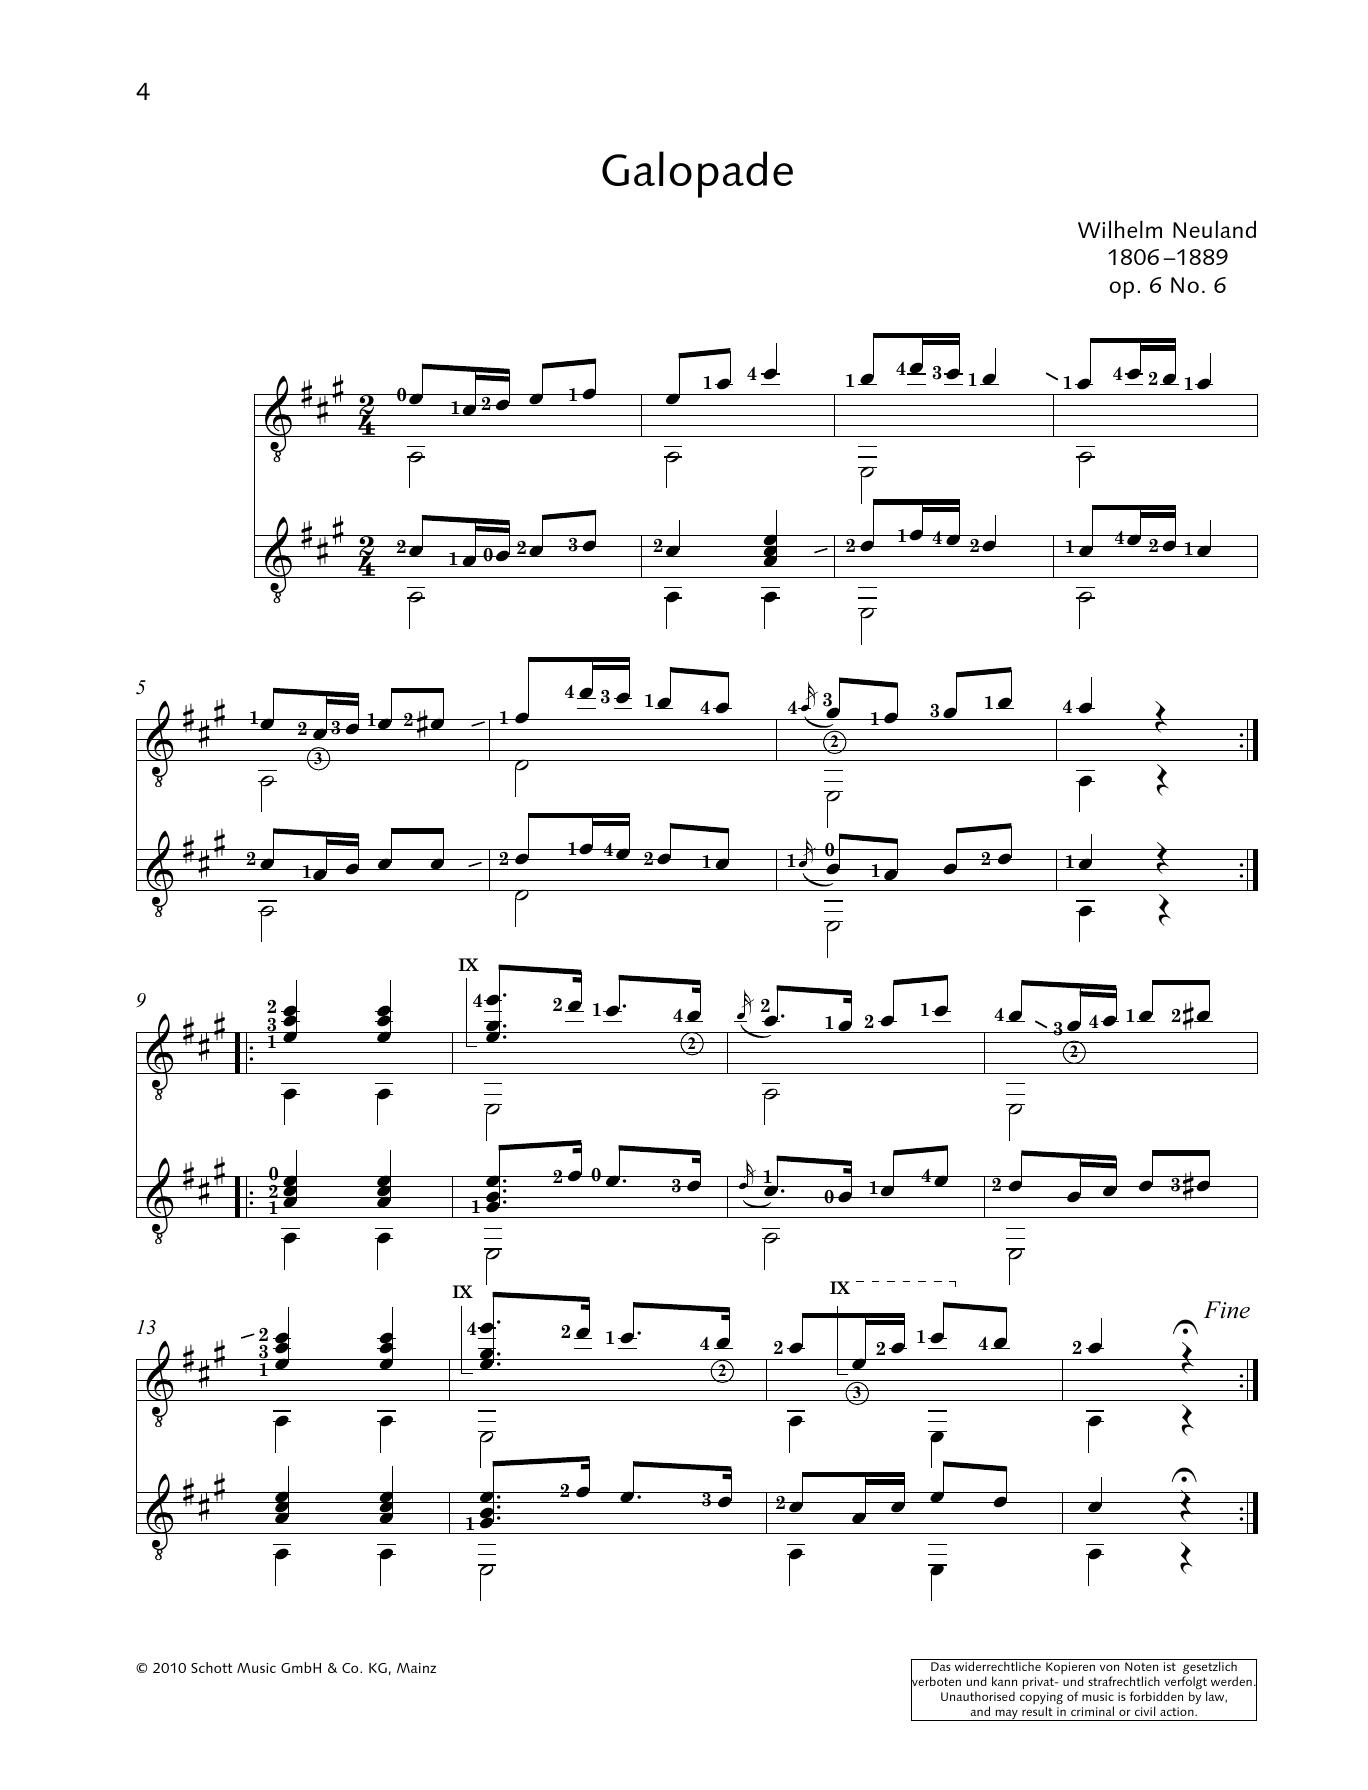 Galopade - Full Score Sheet Music